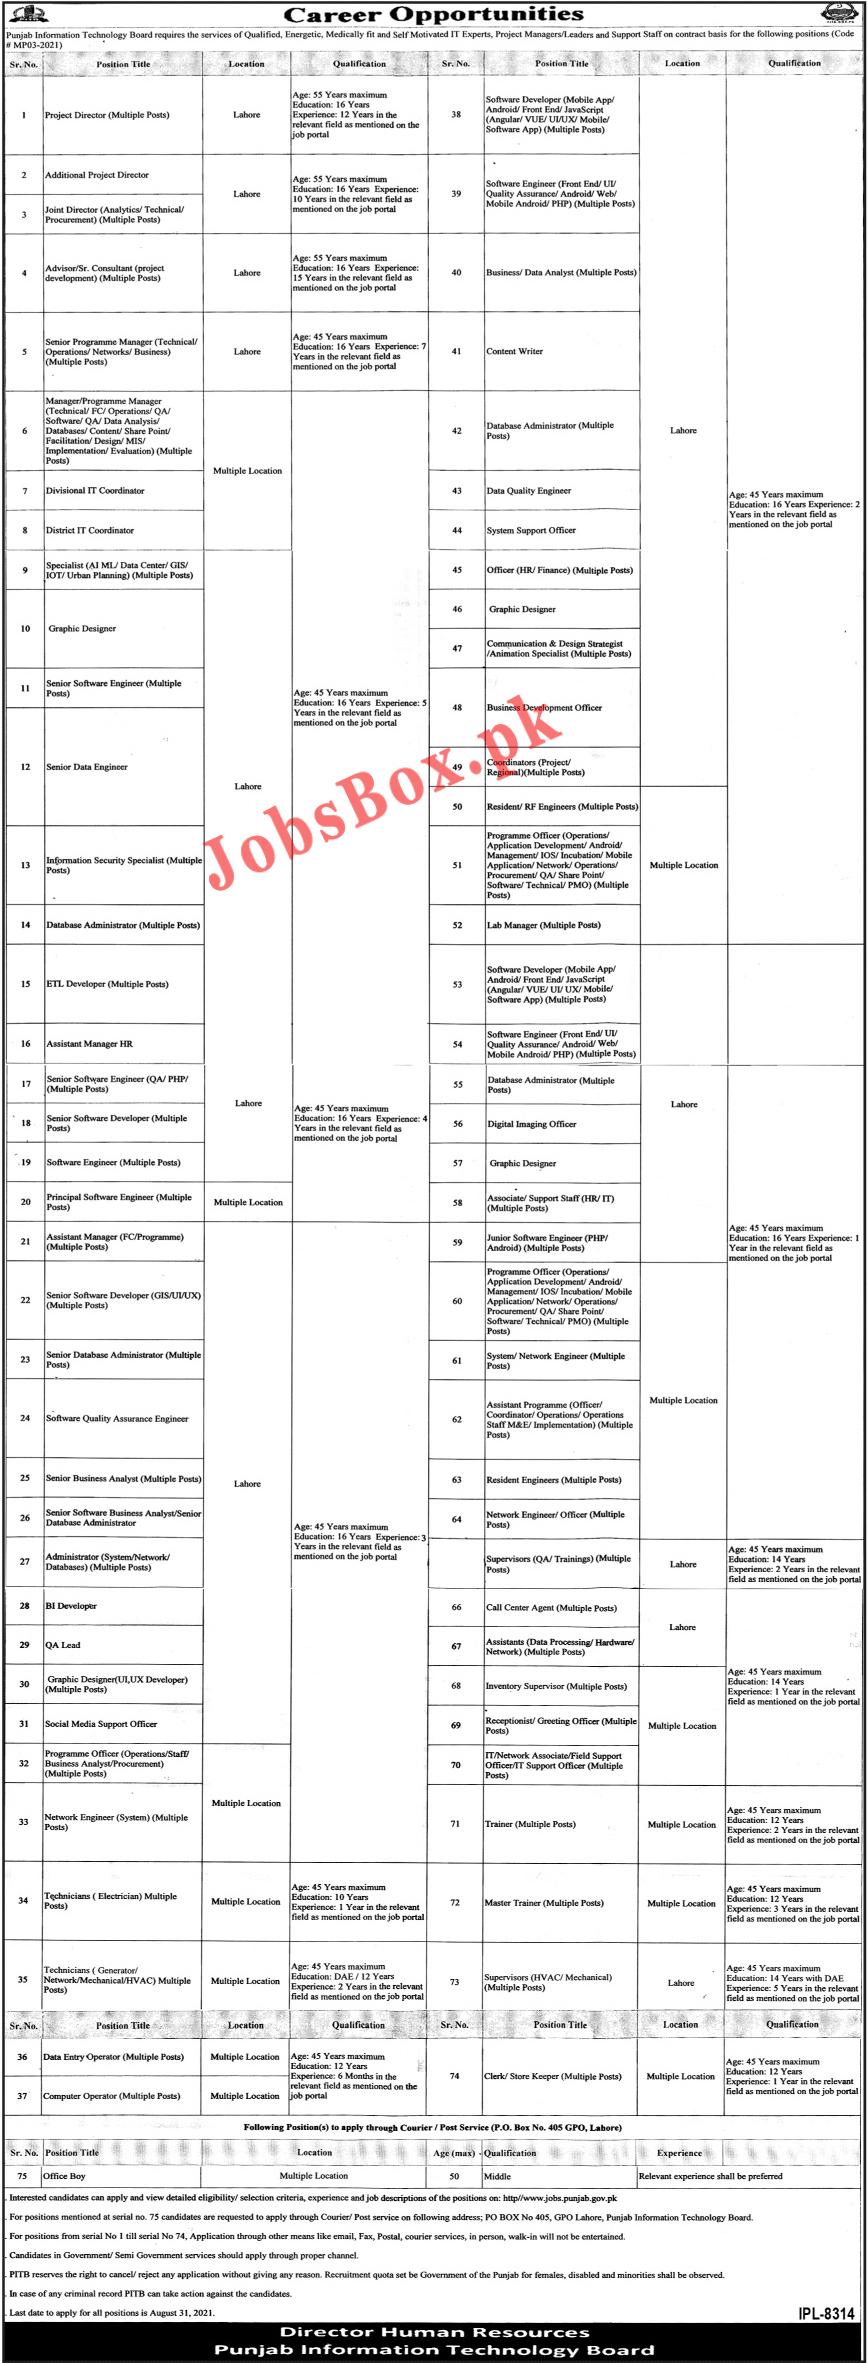 Punjab Information Technology Board PITB Jobs 2021 – Apply Online